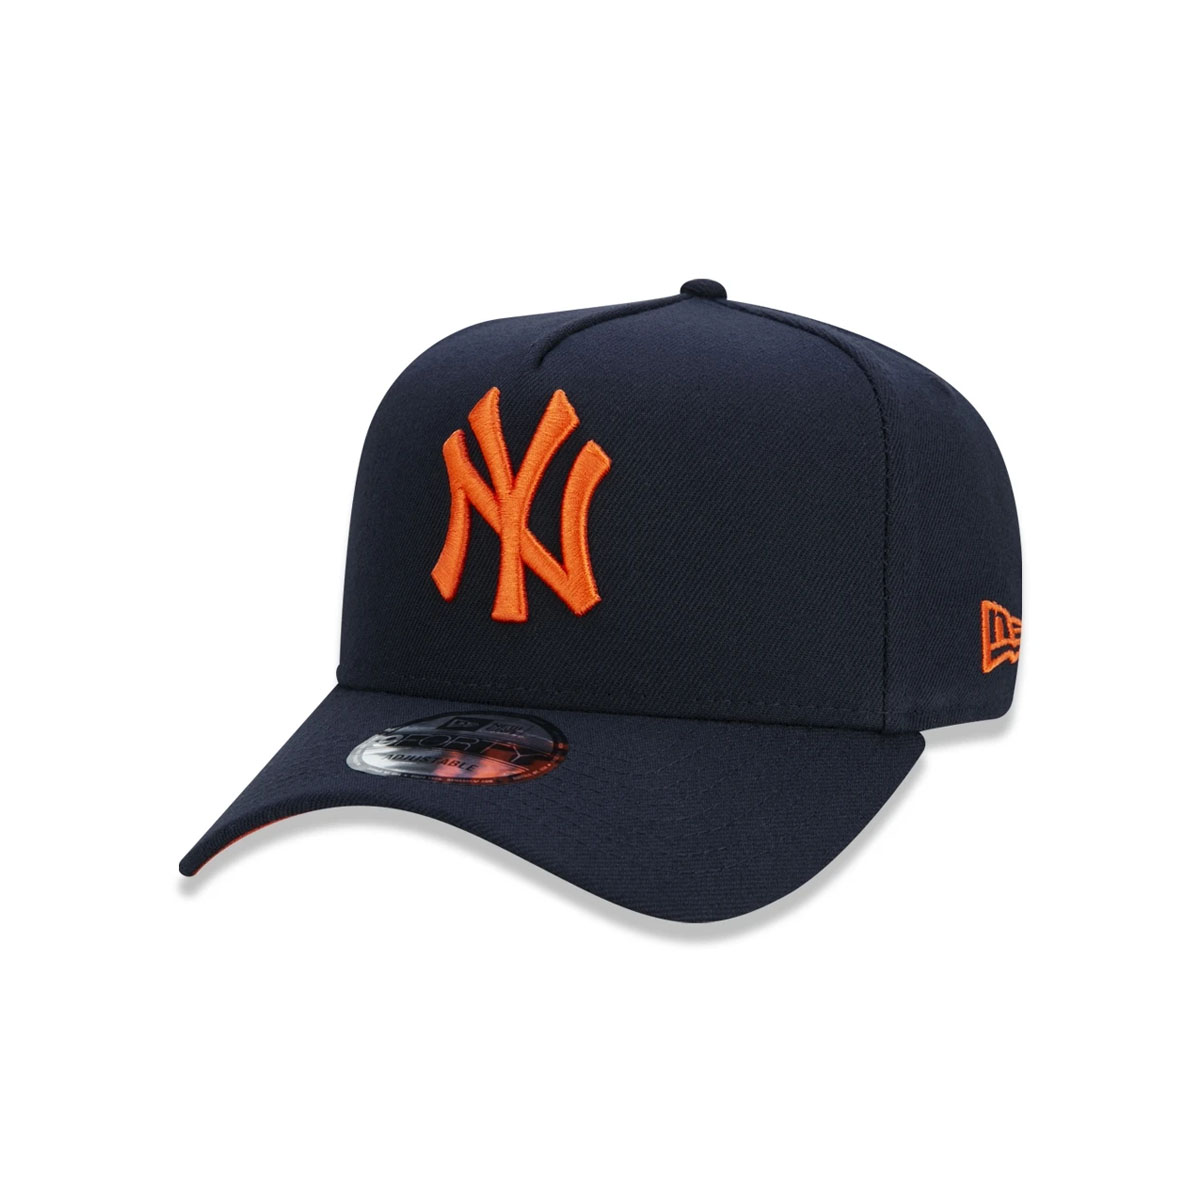 Boné New Era New York Yankees Marinho